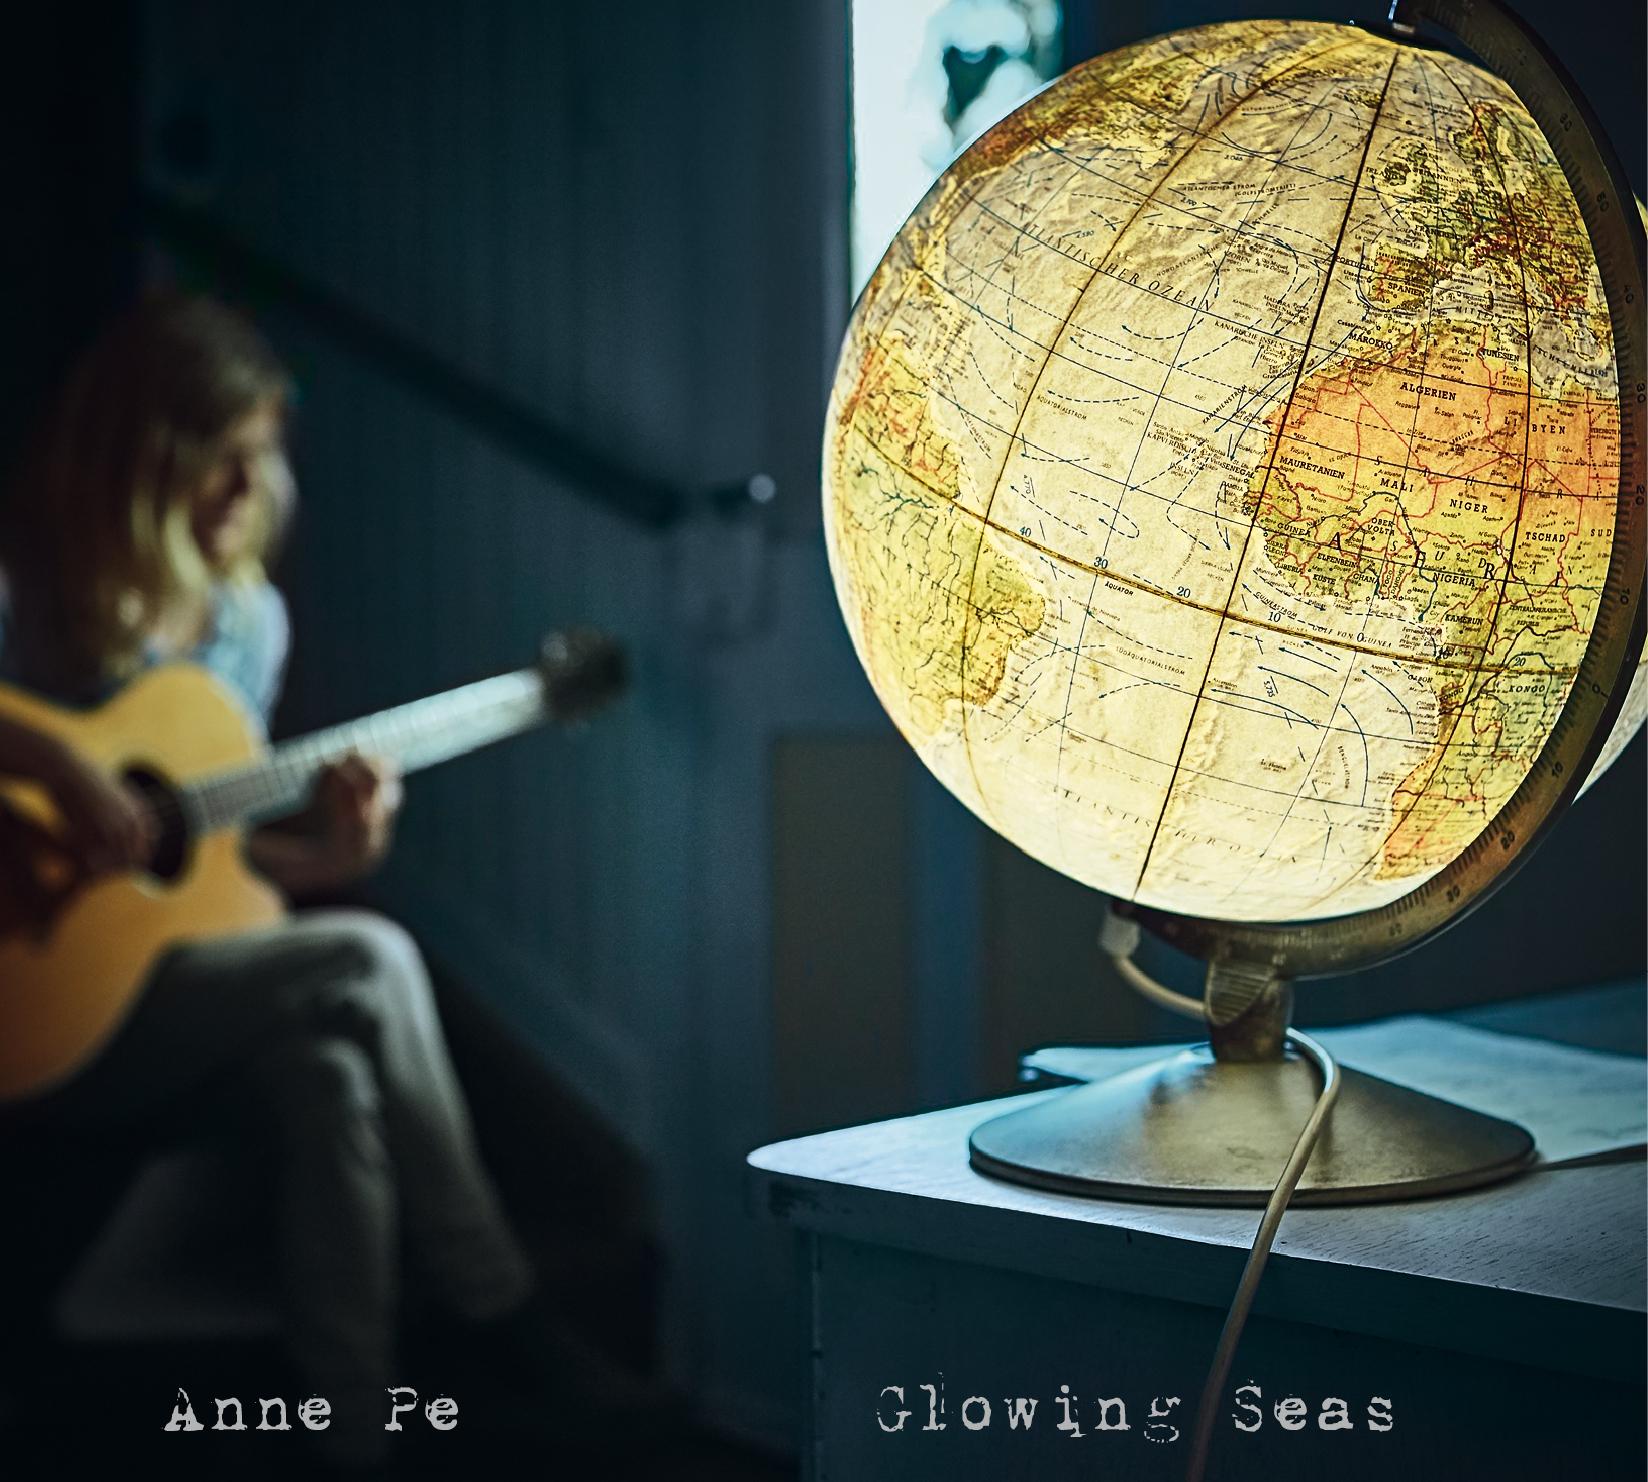 Album Cover Glowing Seas